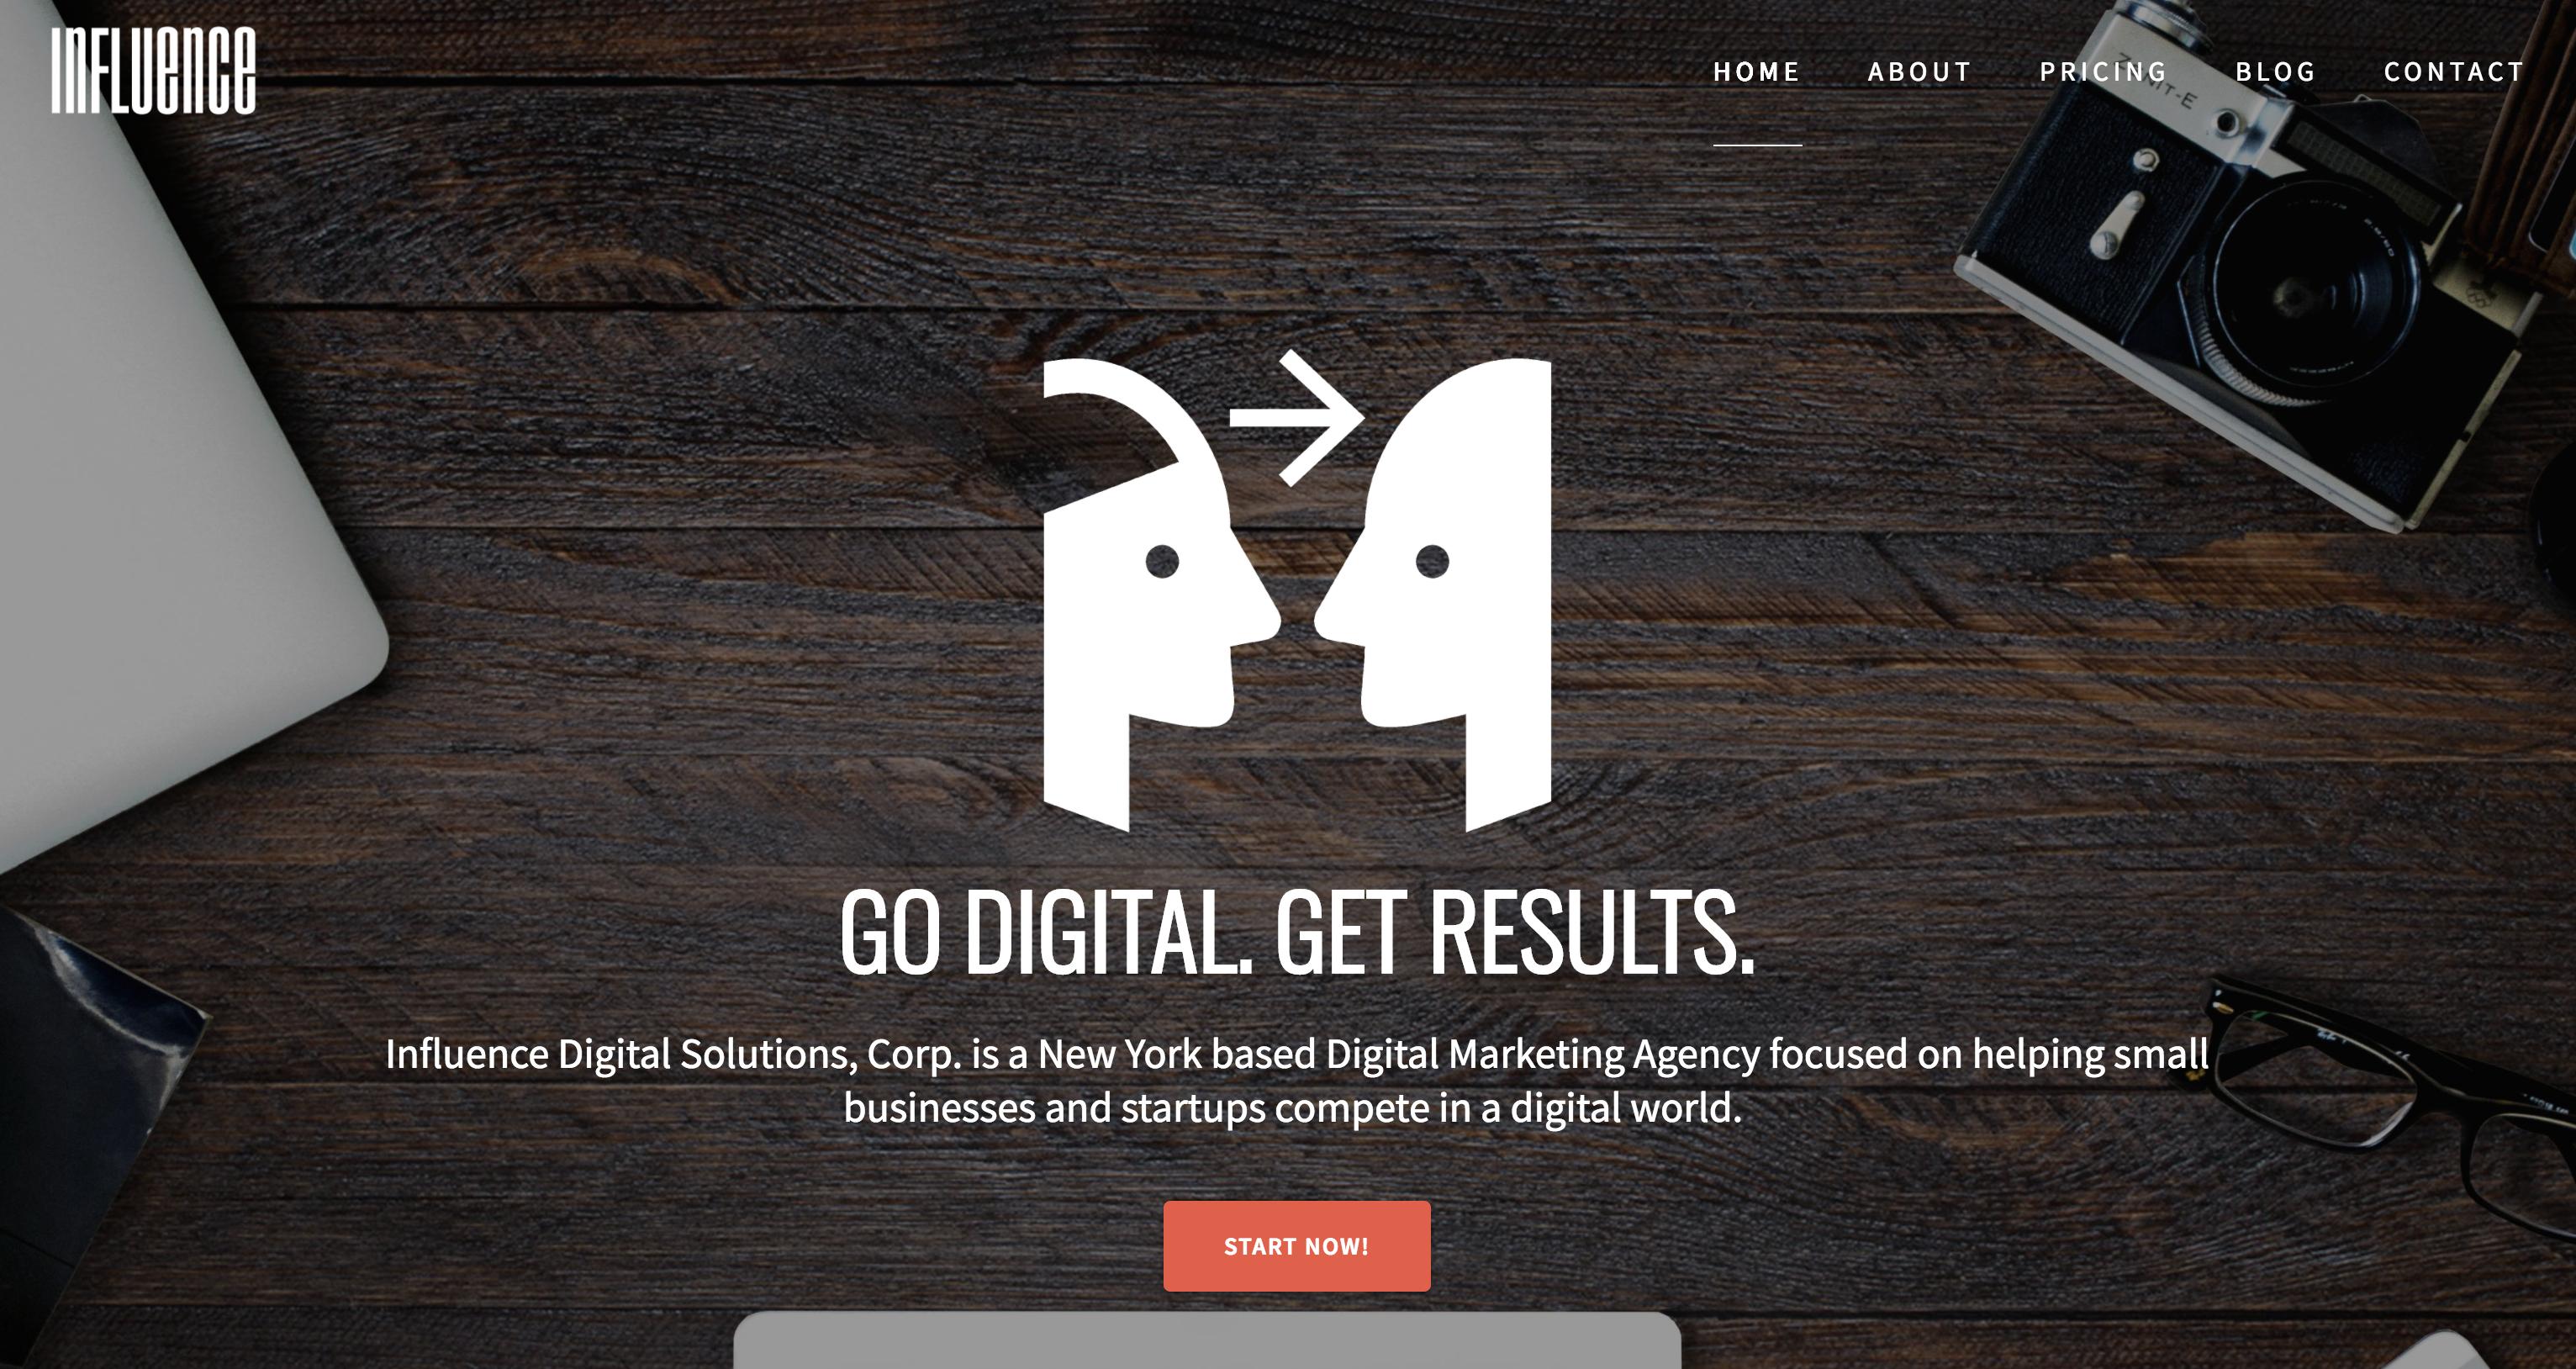 Influence Digital Solutions | Go Digital  Get Results